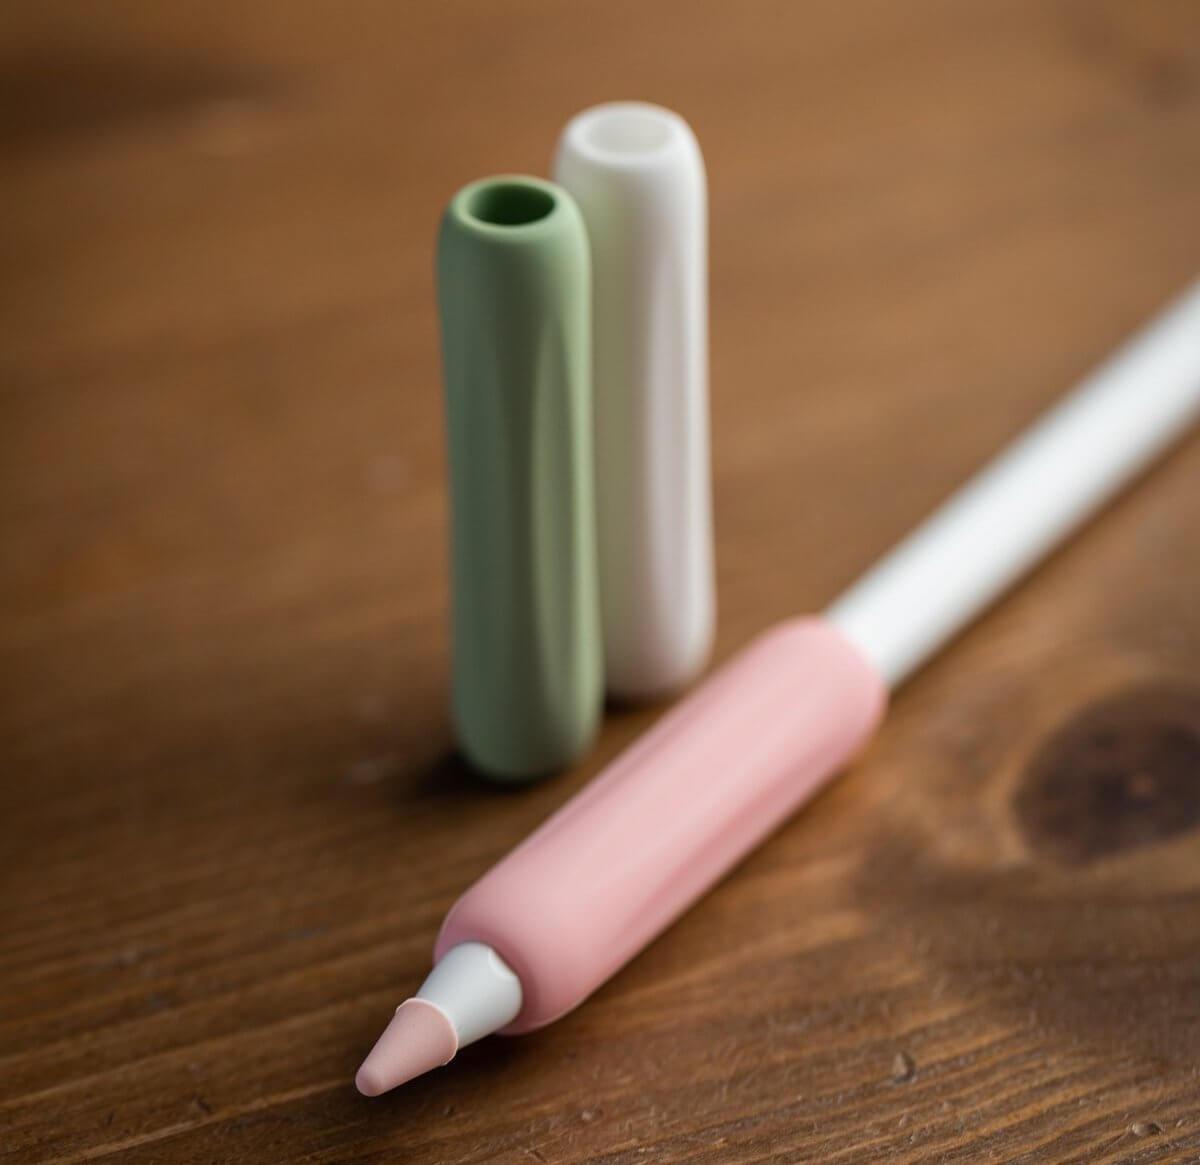 pen-tips-grips-101321